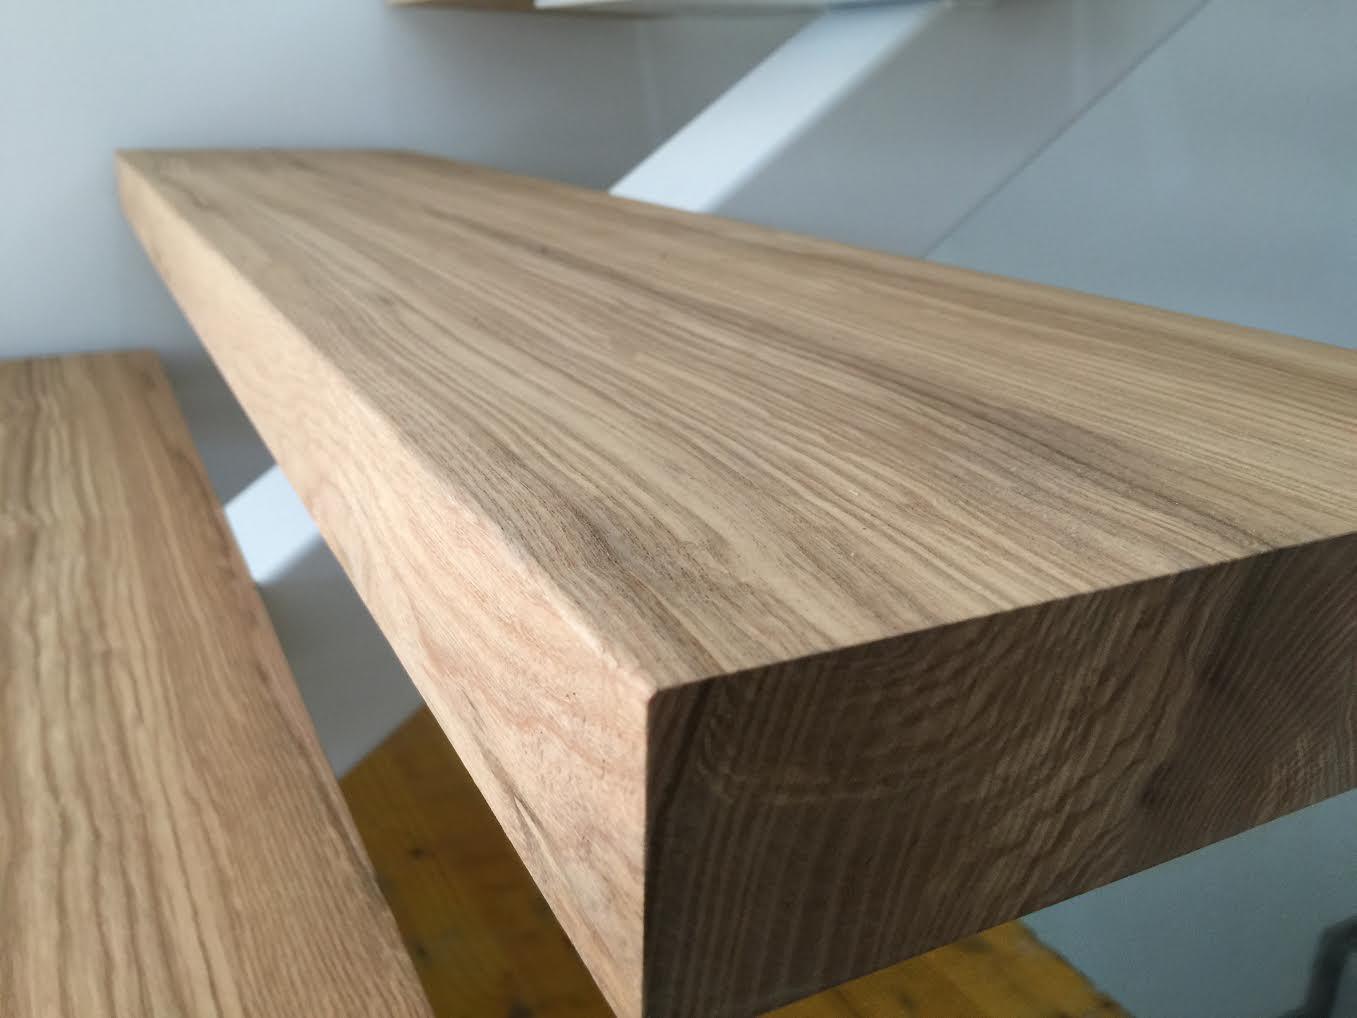 escaliers acier escalier contemporain sur mesure. Black Bedroom Furniture Sets. Home Design Ideas